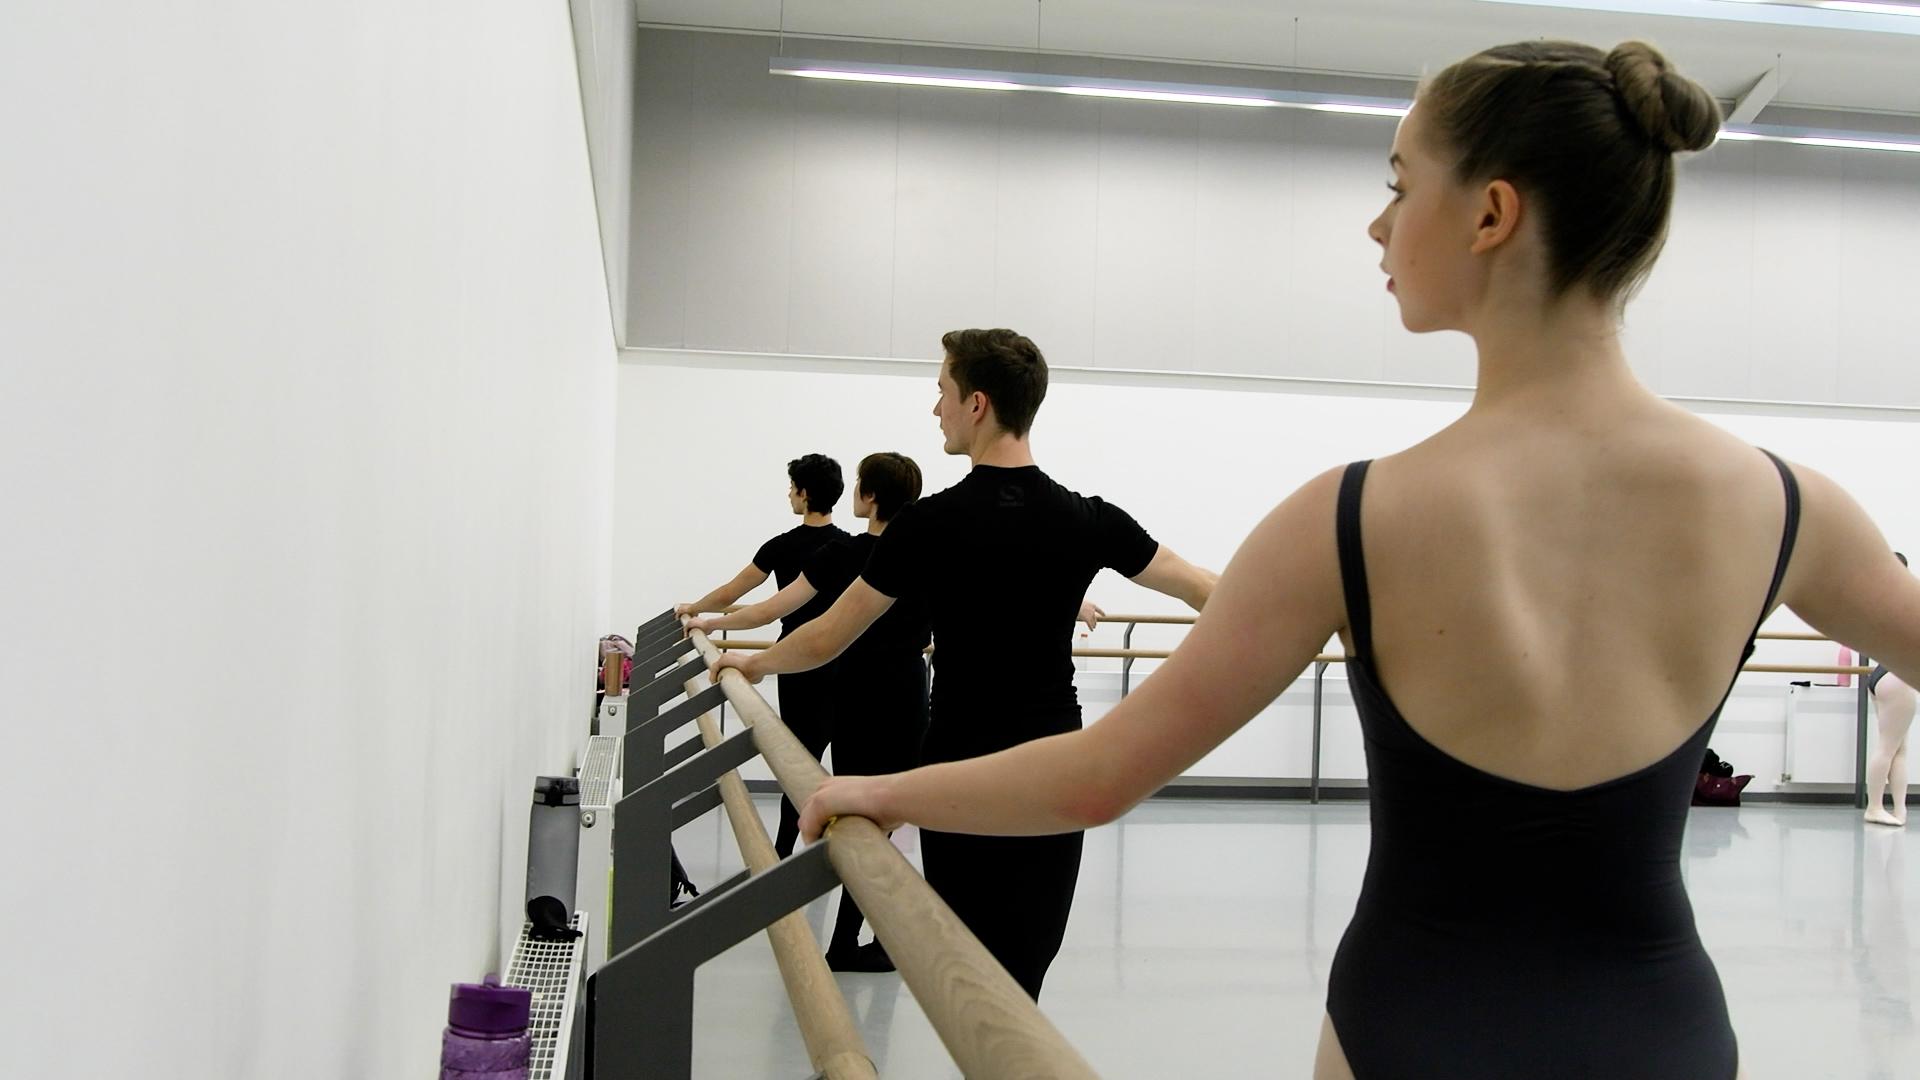 Brunch Ballet Buddies (ages 60+) Online Summer School Image